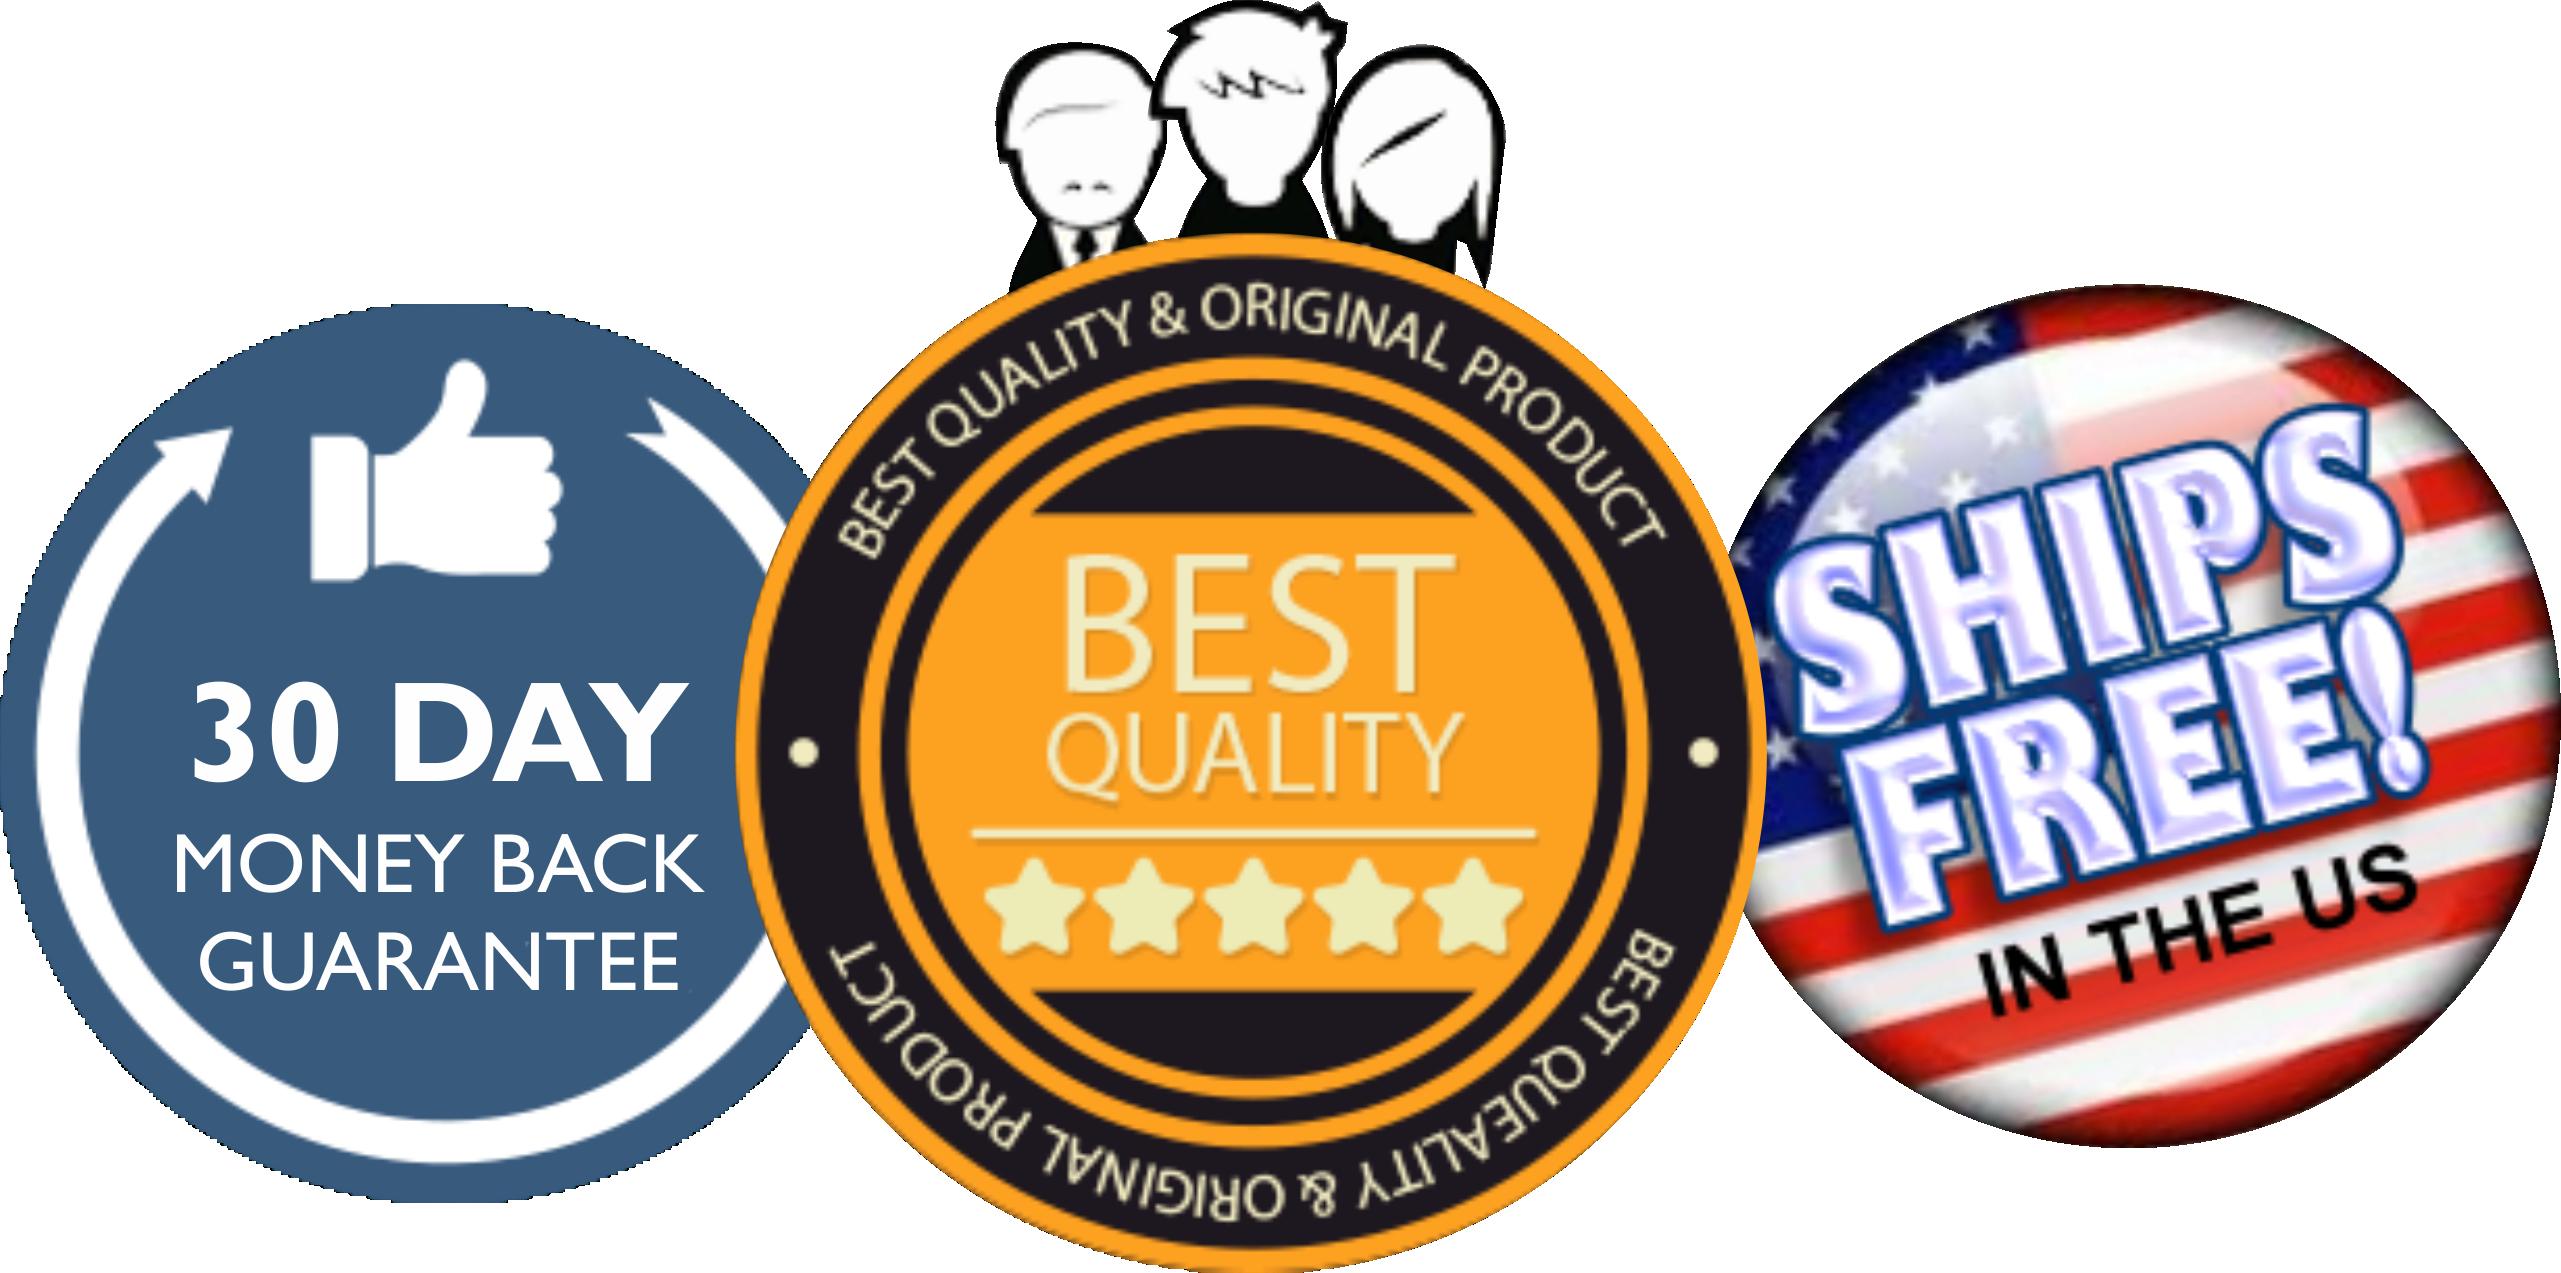 30 dias best quality ships free - Smith's PP1 Pocket Pal Multifunction Sharpener, Grey